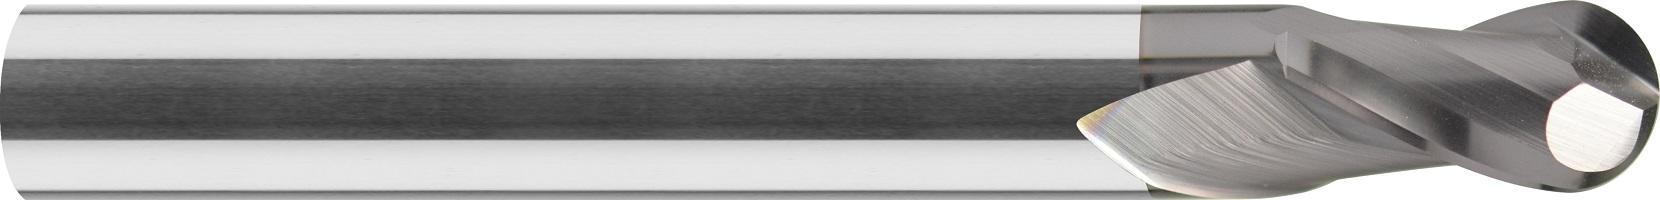 Frez kula, długi, Z-2, HA, 65 HRC, VHM TiALN (466)